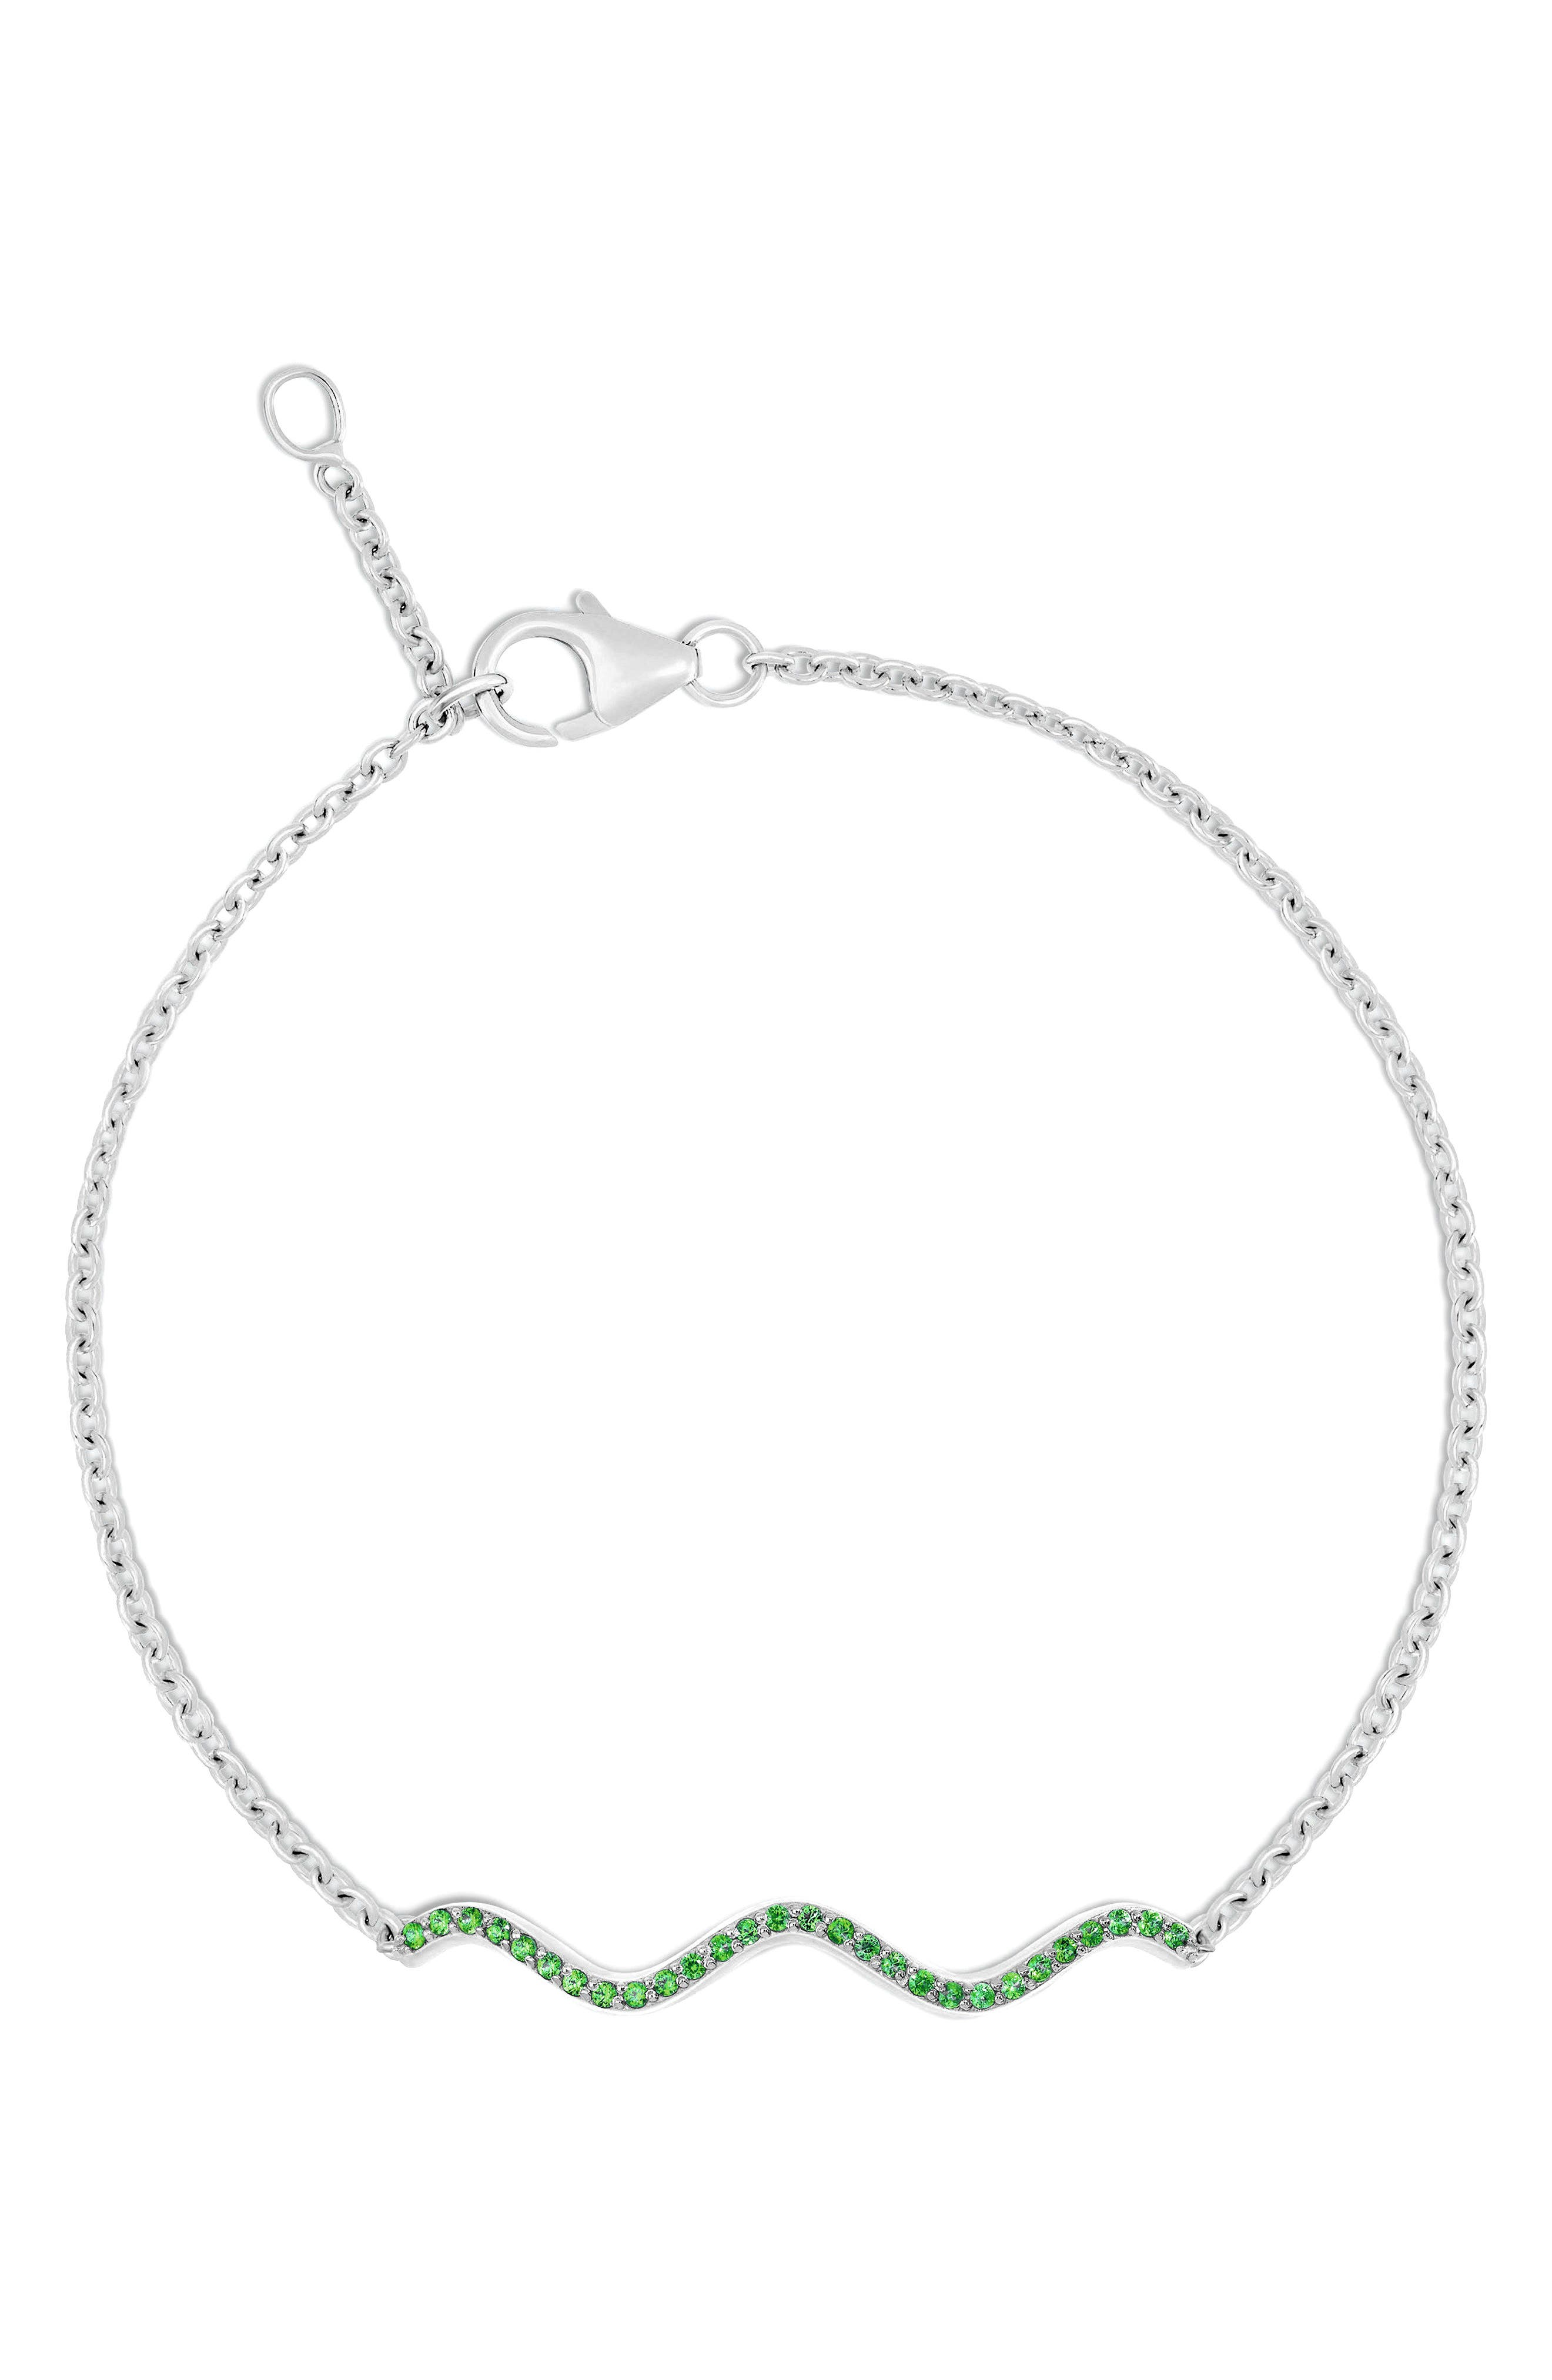 Memphis Chained Wave Tsavorite Bracelet,                         Main,                         color, WHITE GOLD